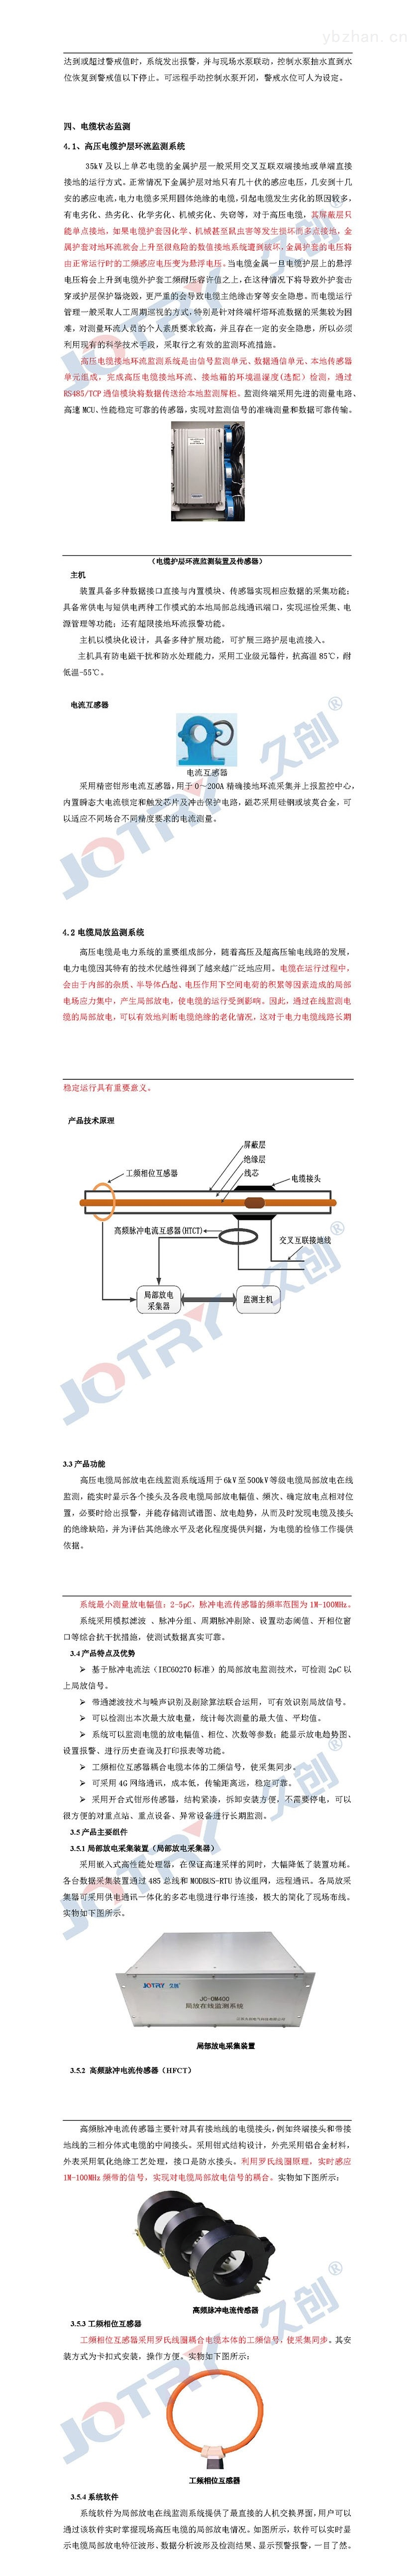 <strong>电缆隧道综合监控系统</strong>02-恢复的02.jpg